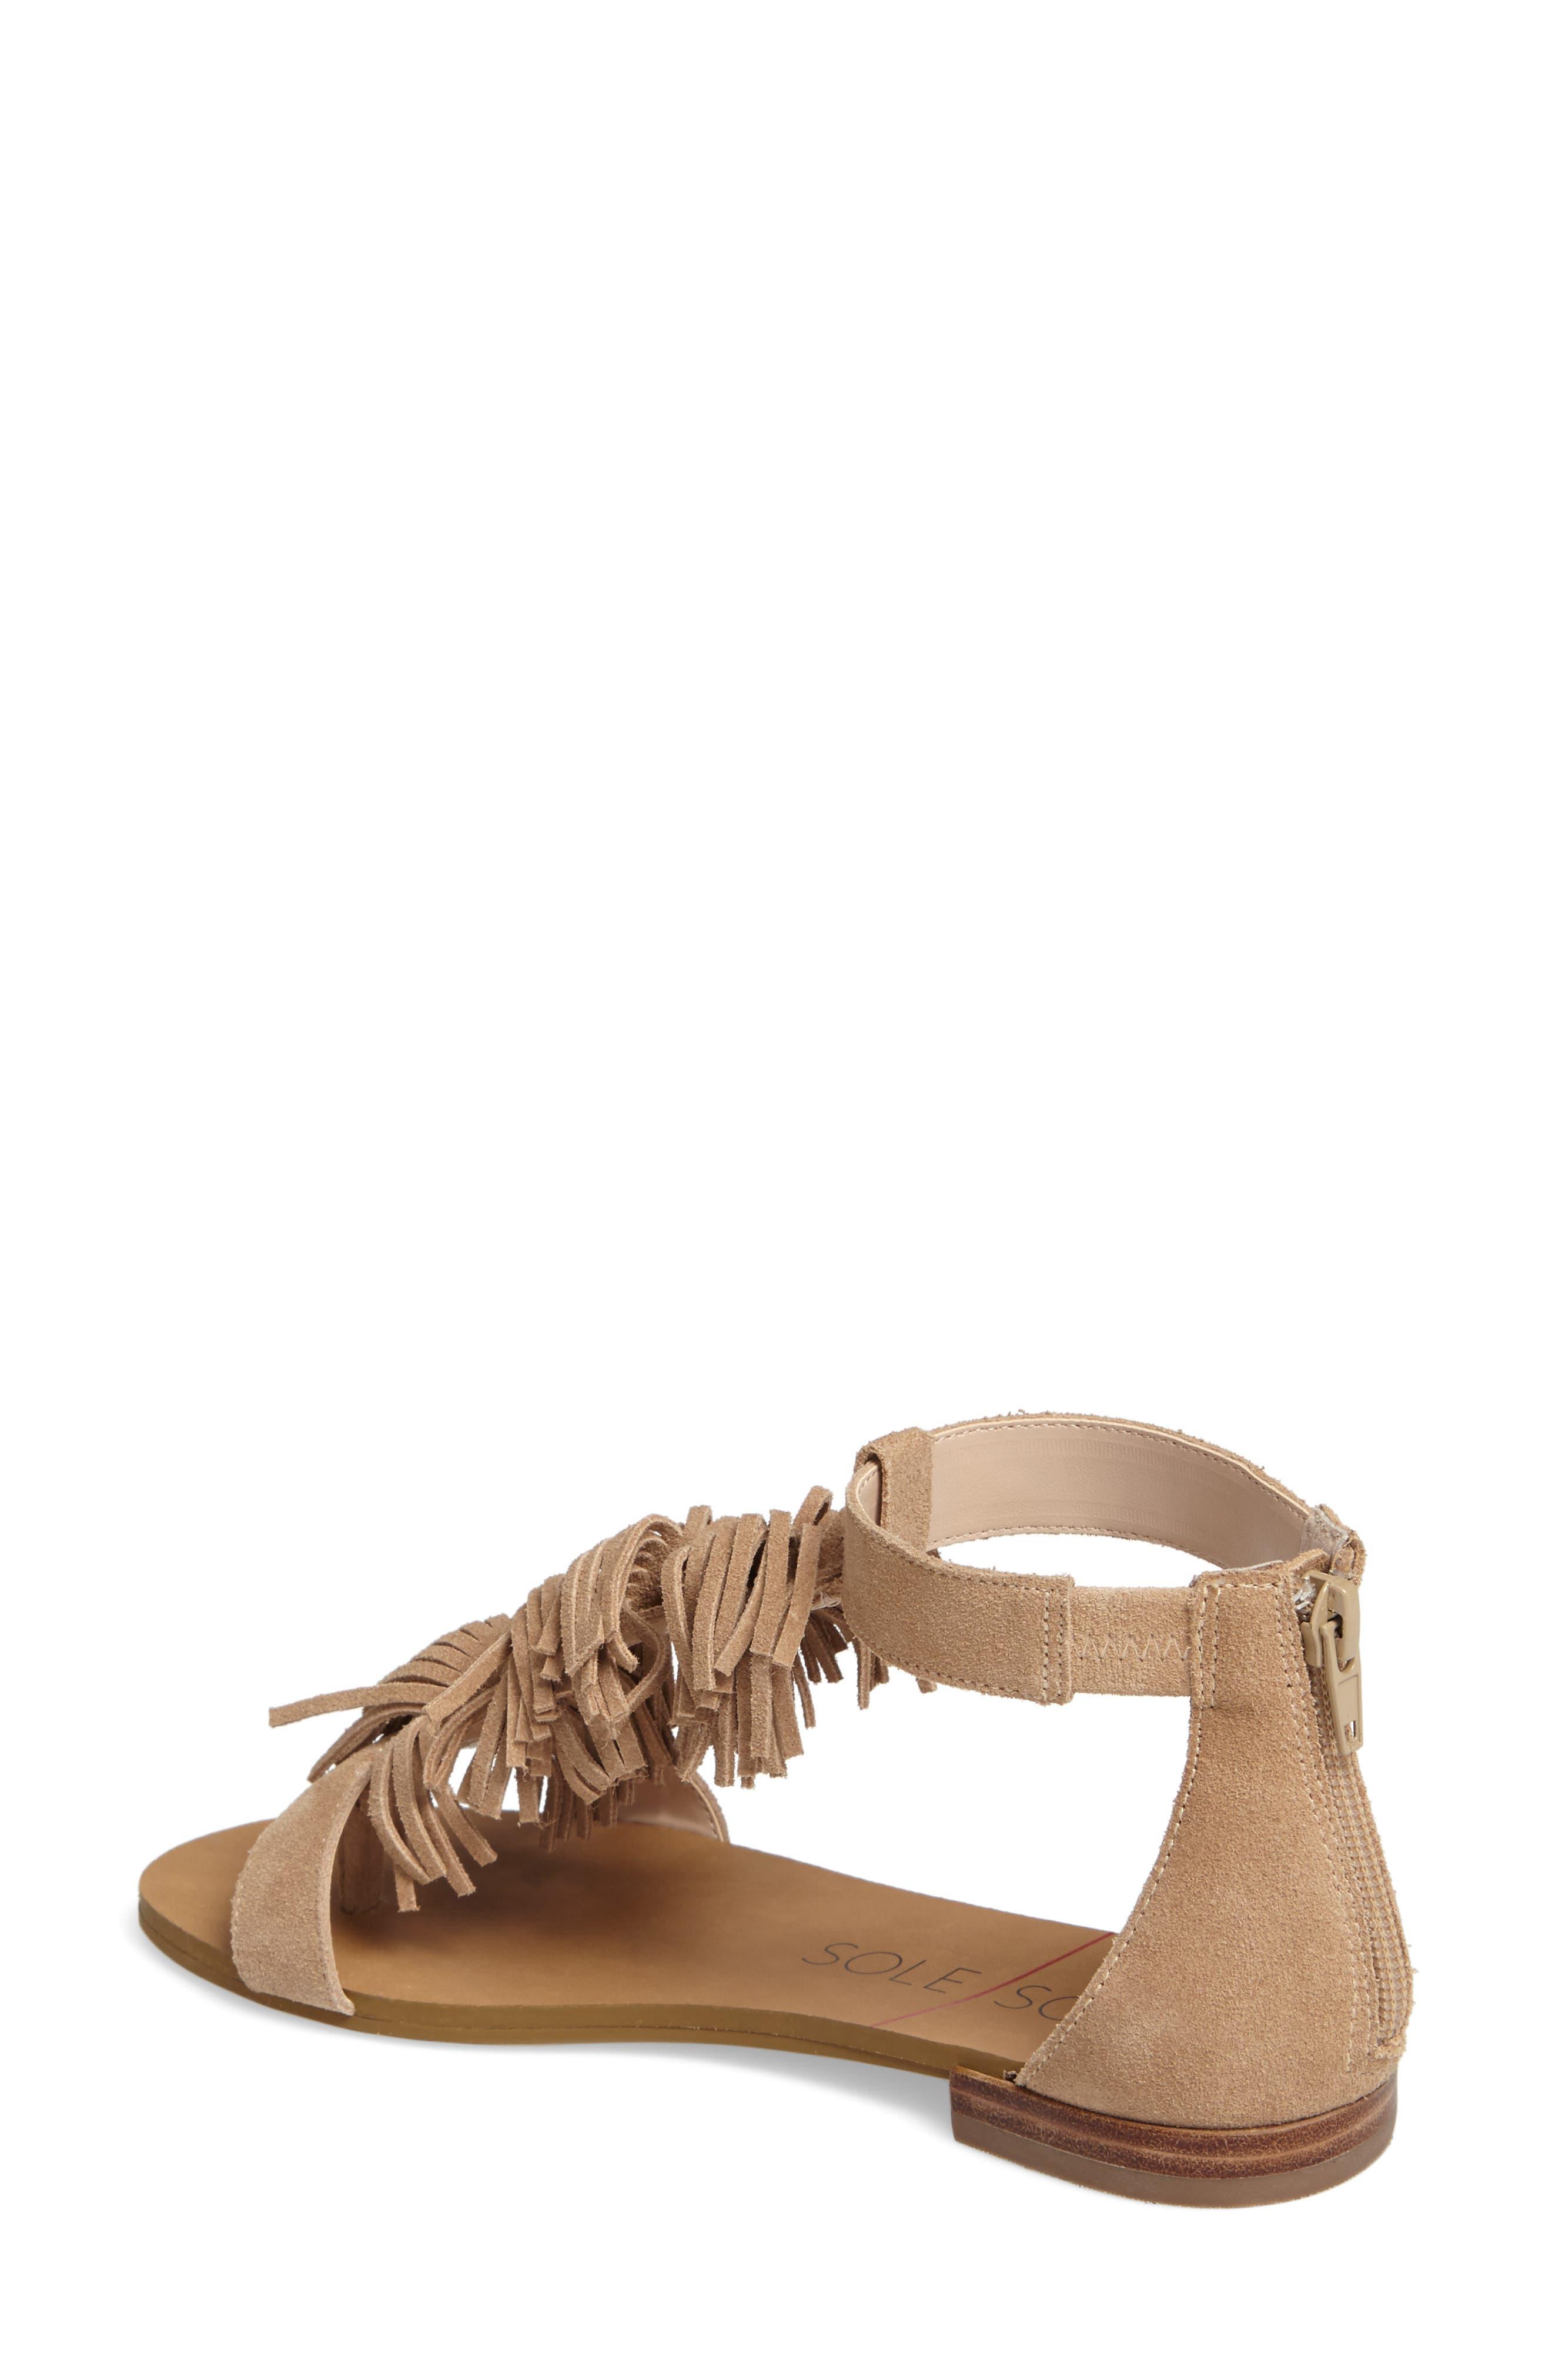 ,                             Koa Fringed T-Strap Sandal,                             Alternate thumbnail 2, color,                             200